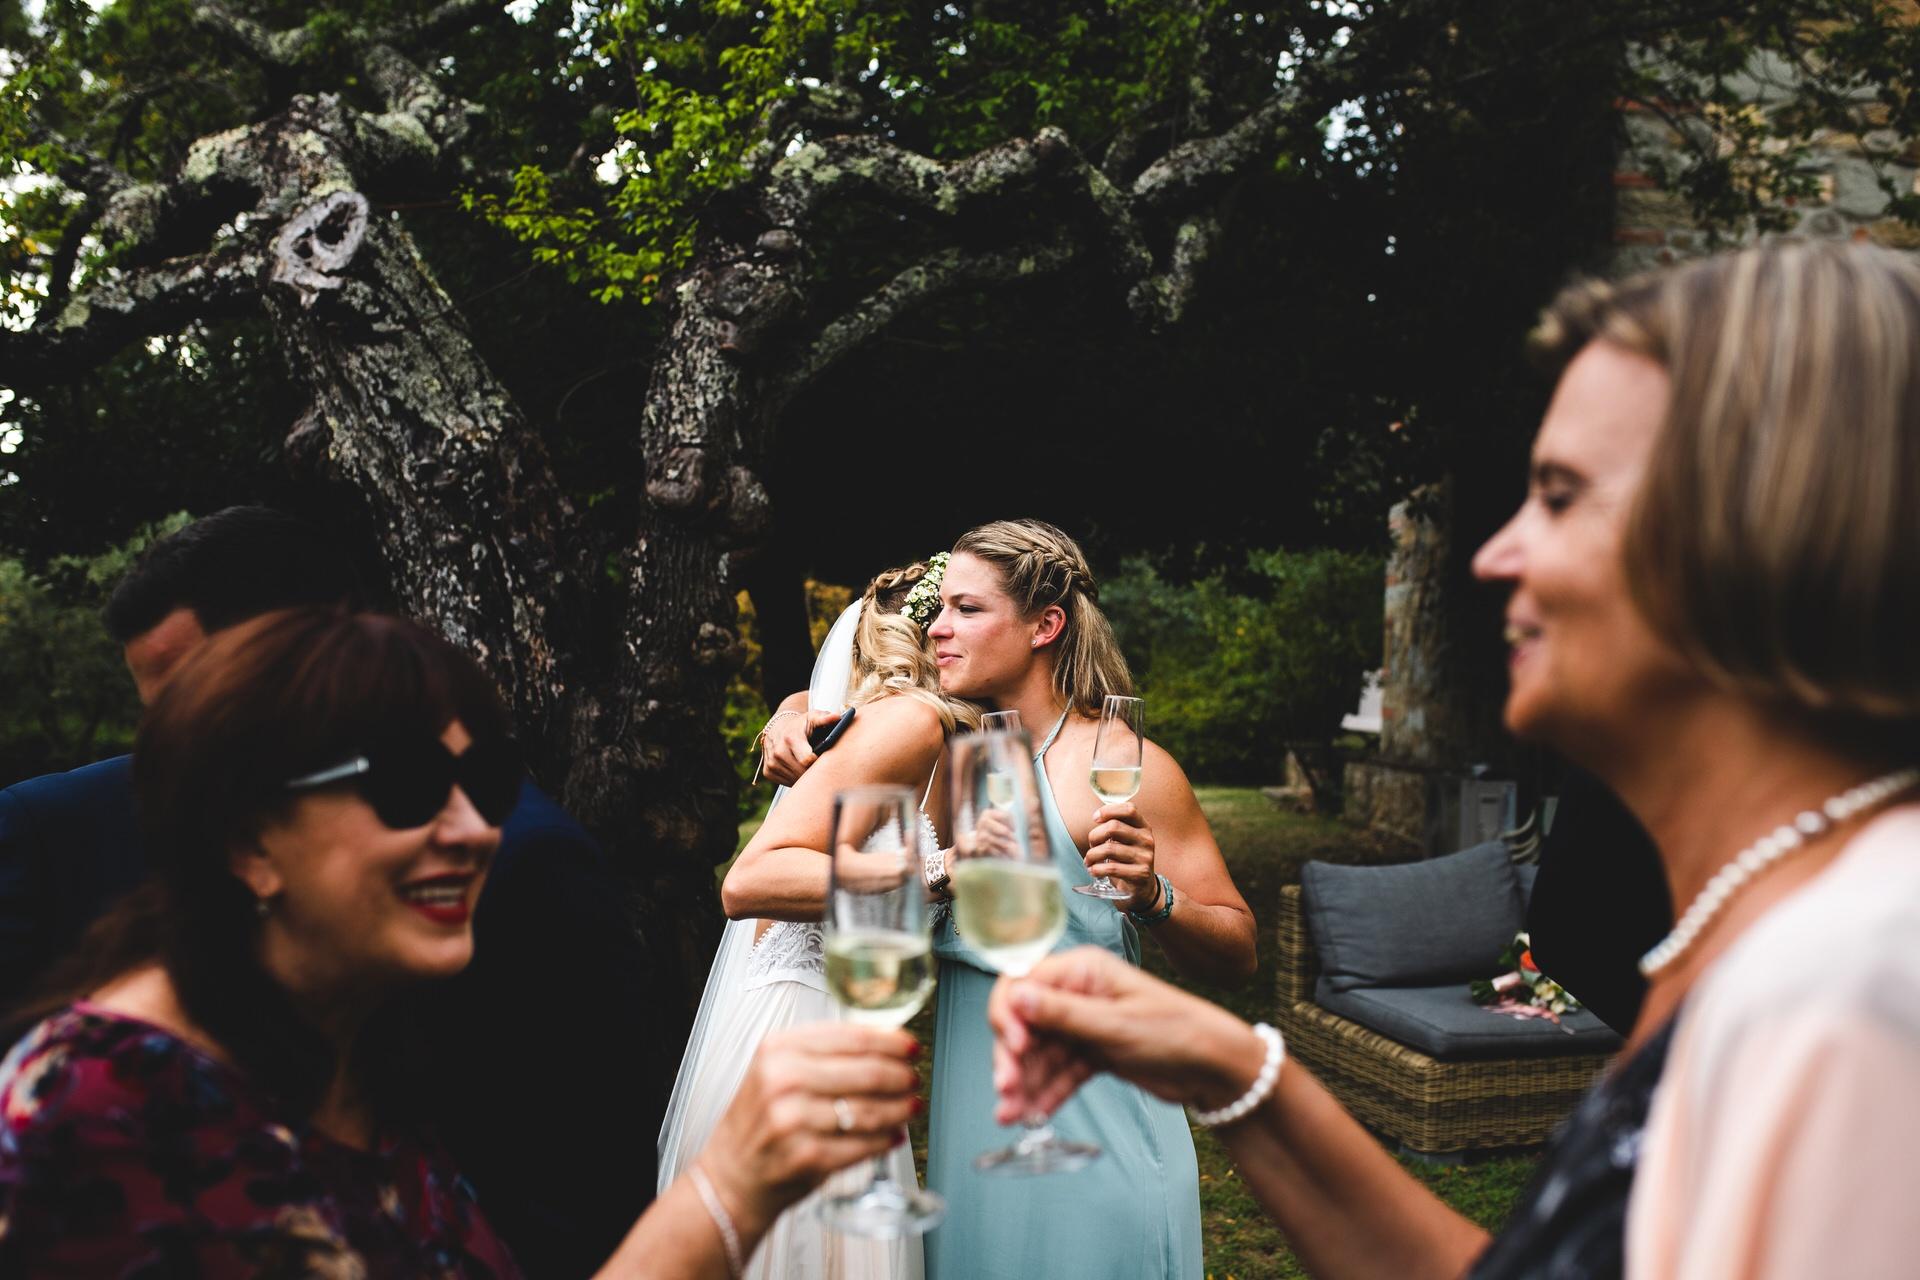 Cheers and hugs for the bride at Villa Olimpia, Ambra, Tuscany